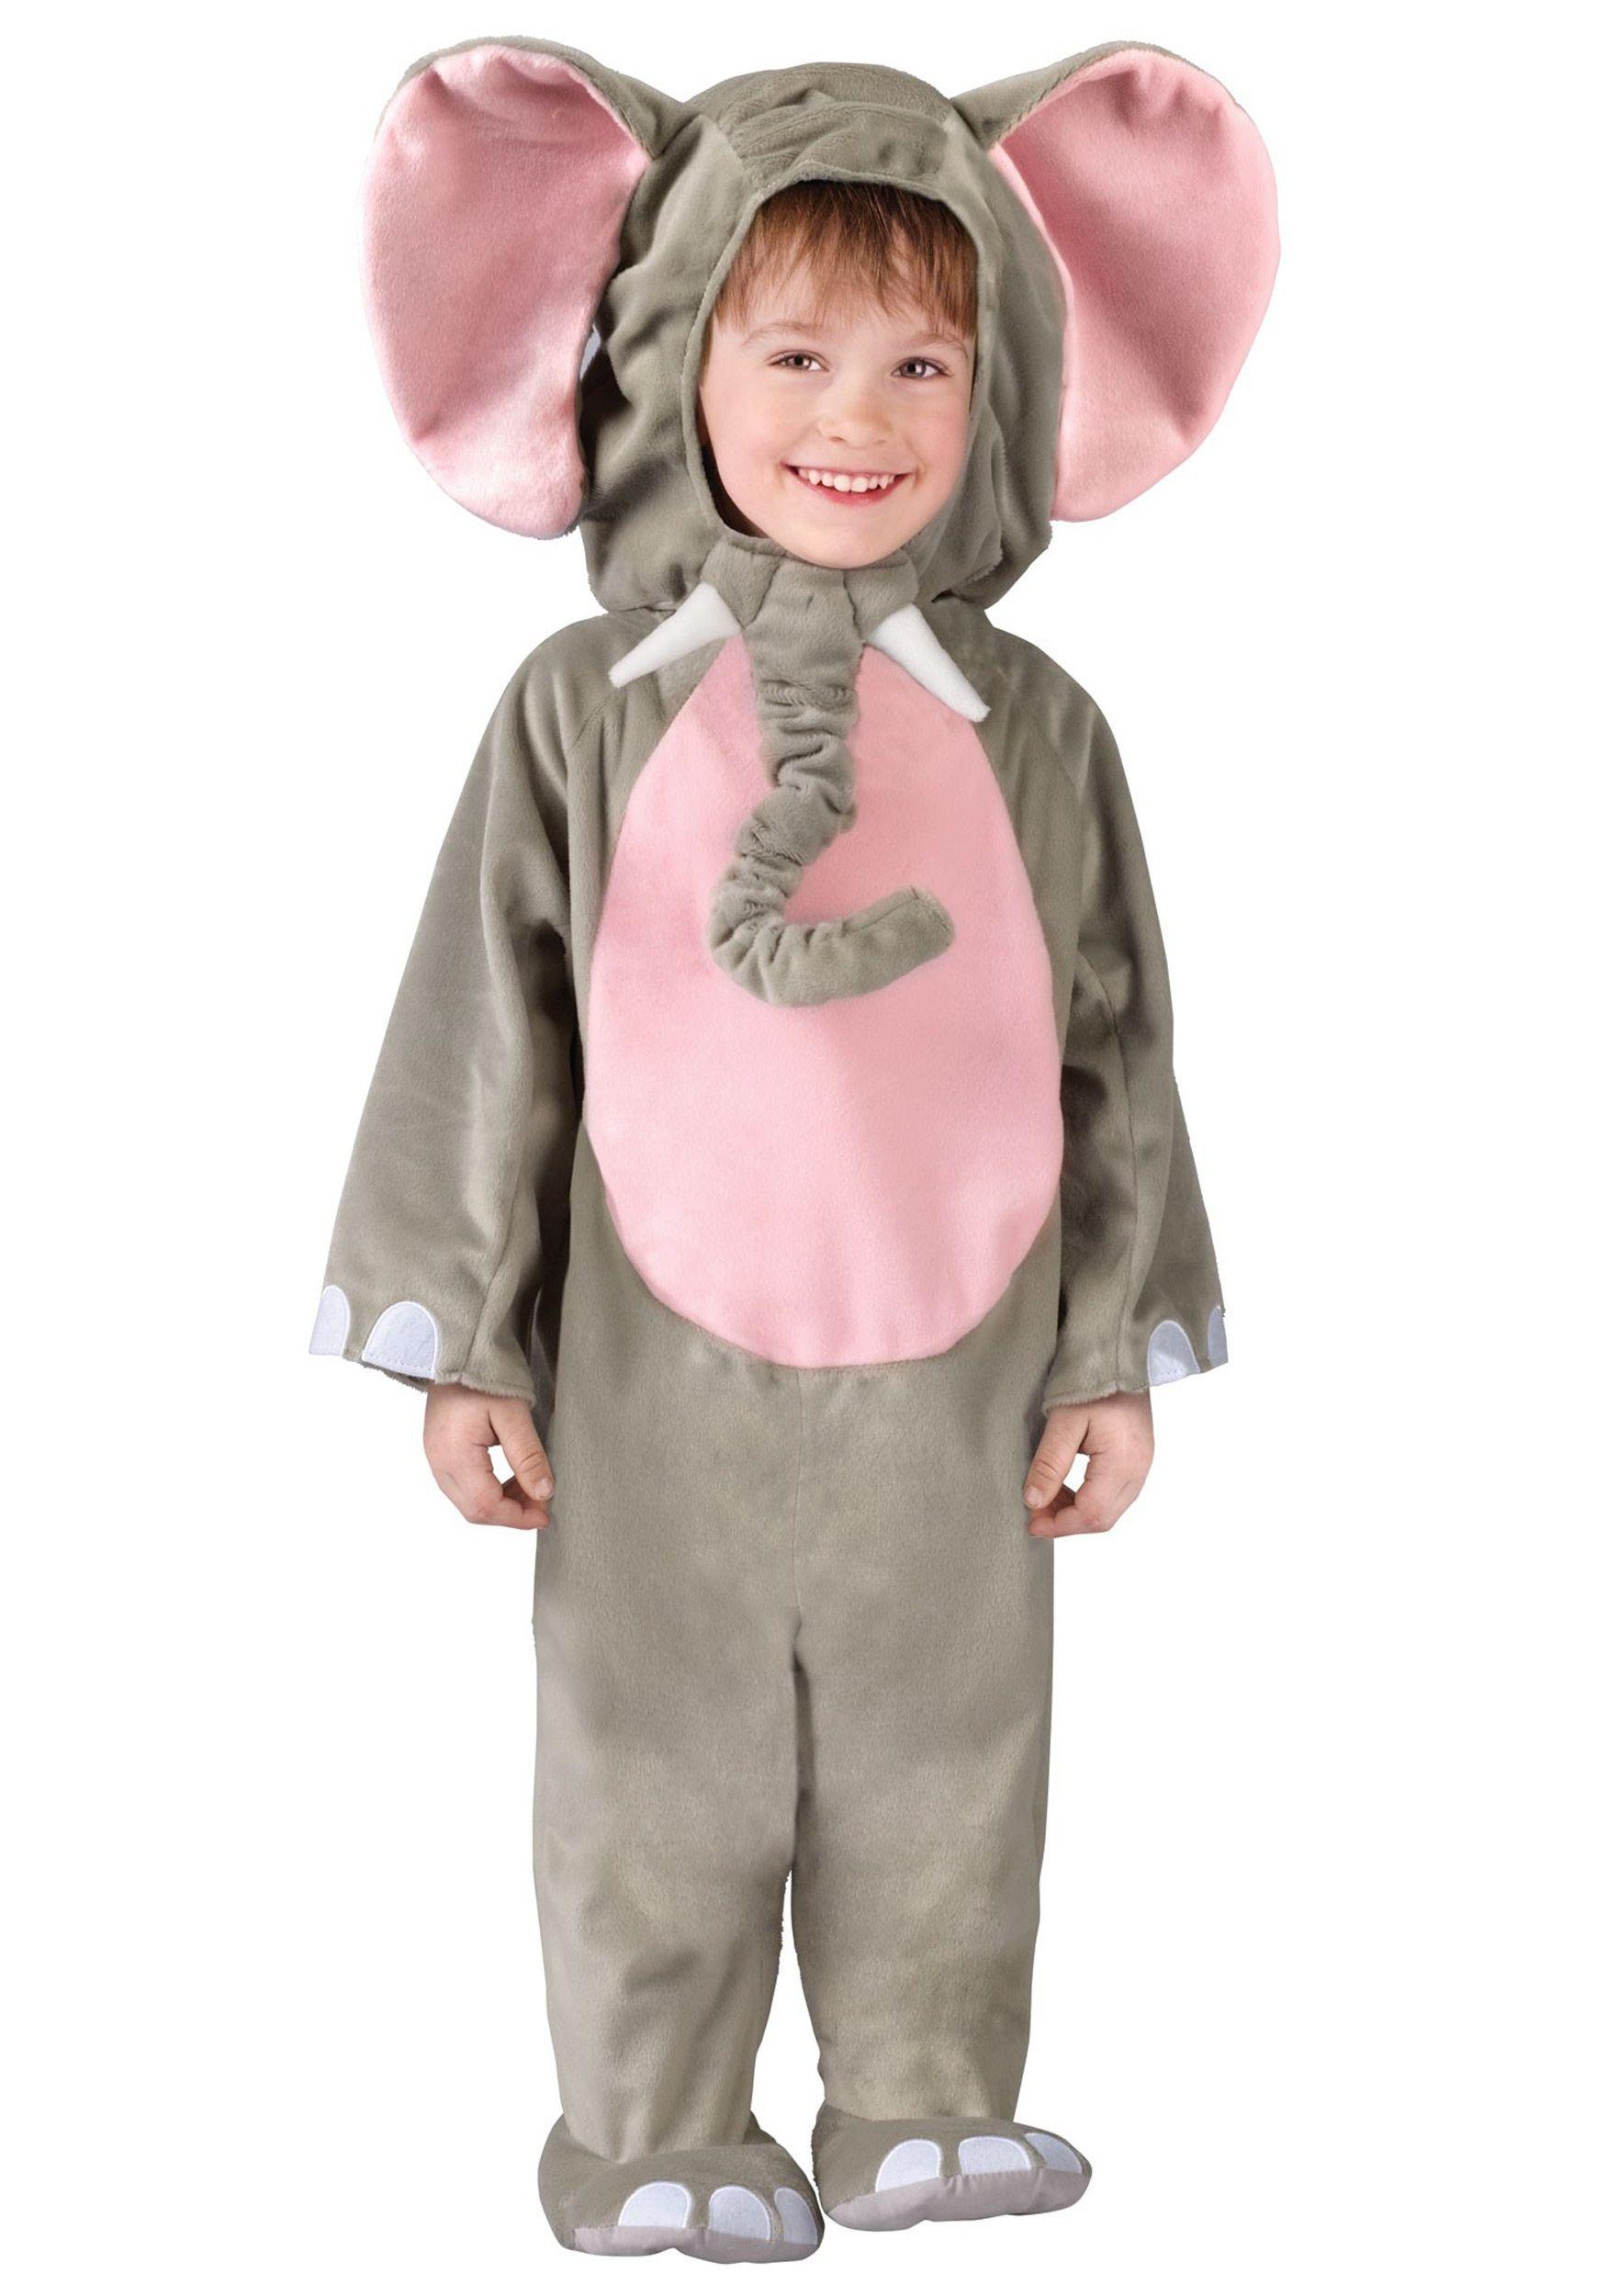 Toddler Elephant Costume | Boys Halloween Costumes | Pinterest ...